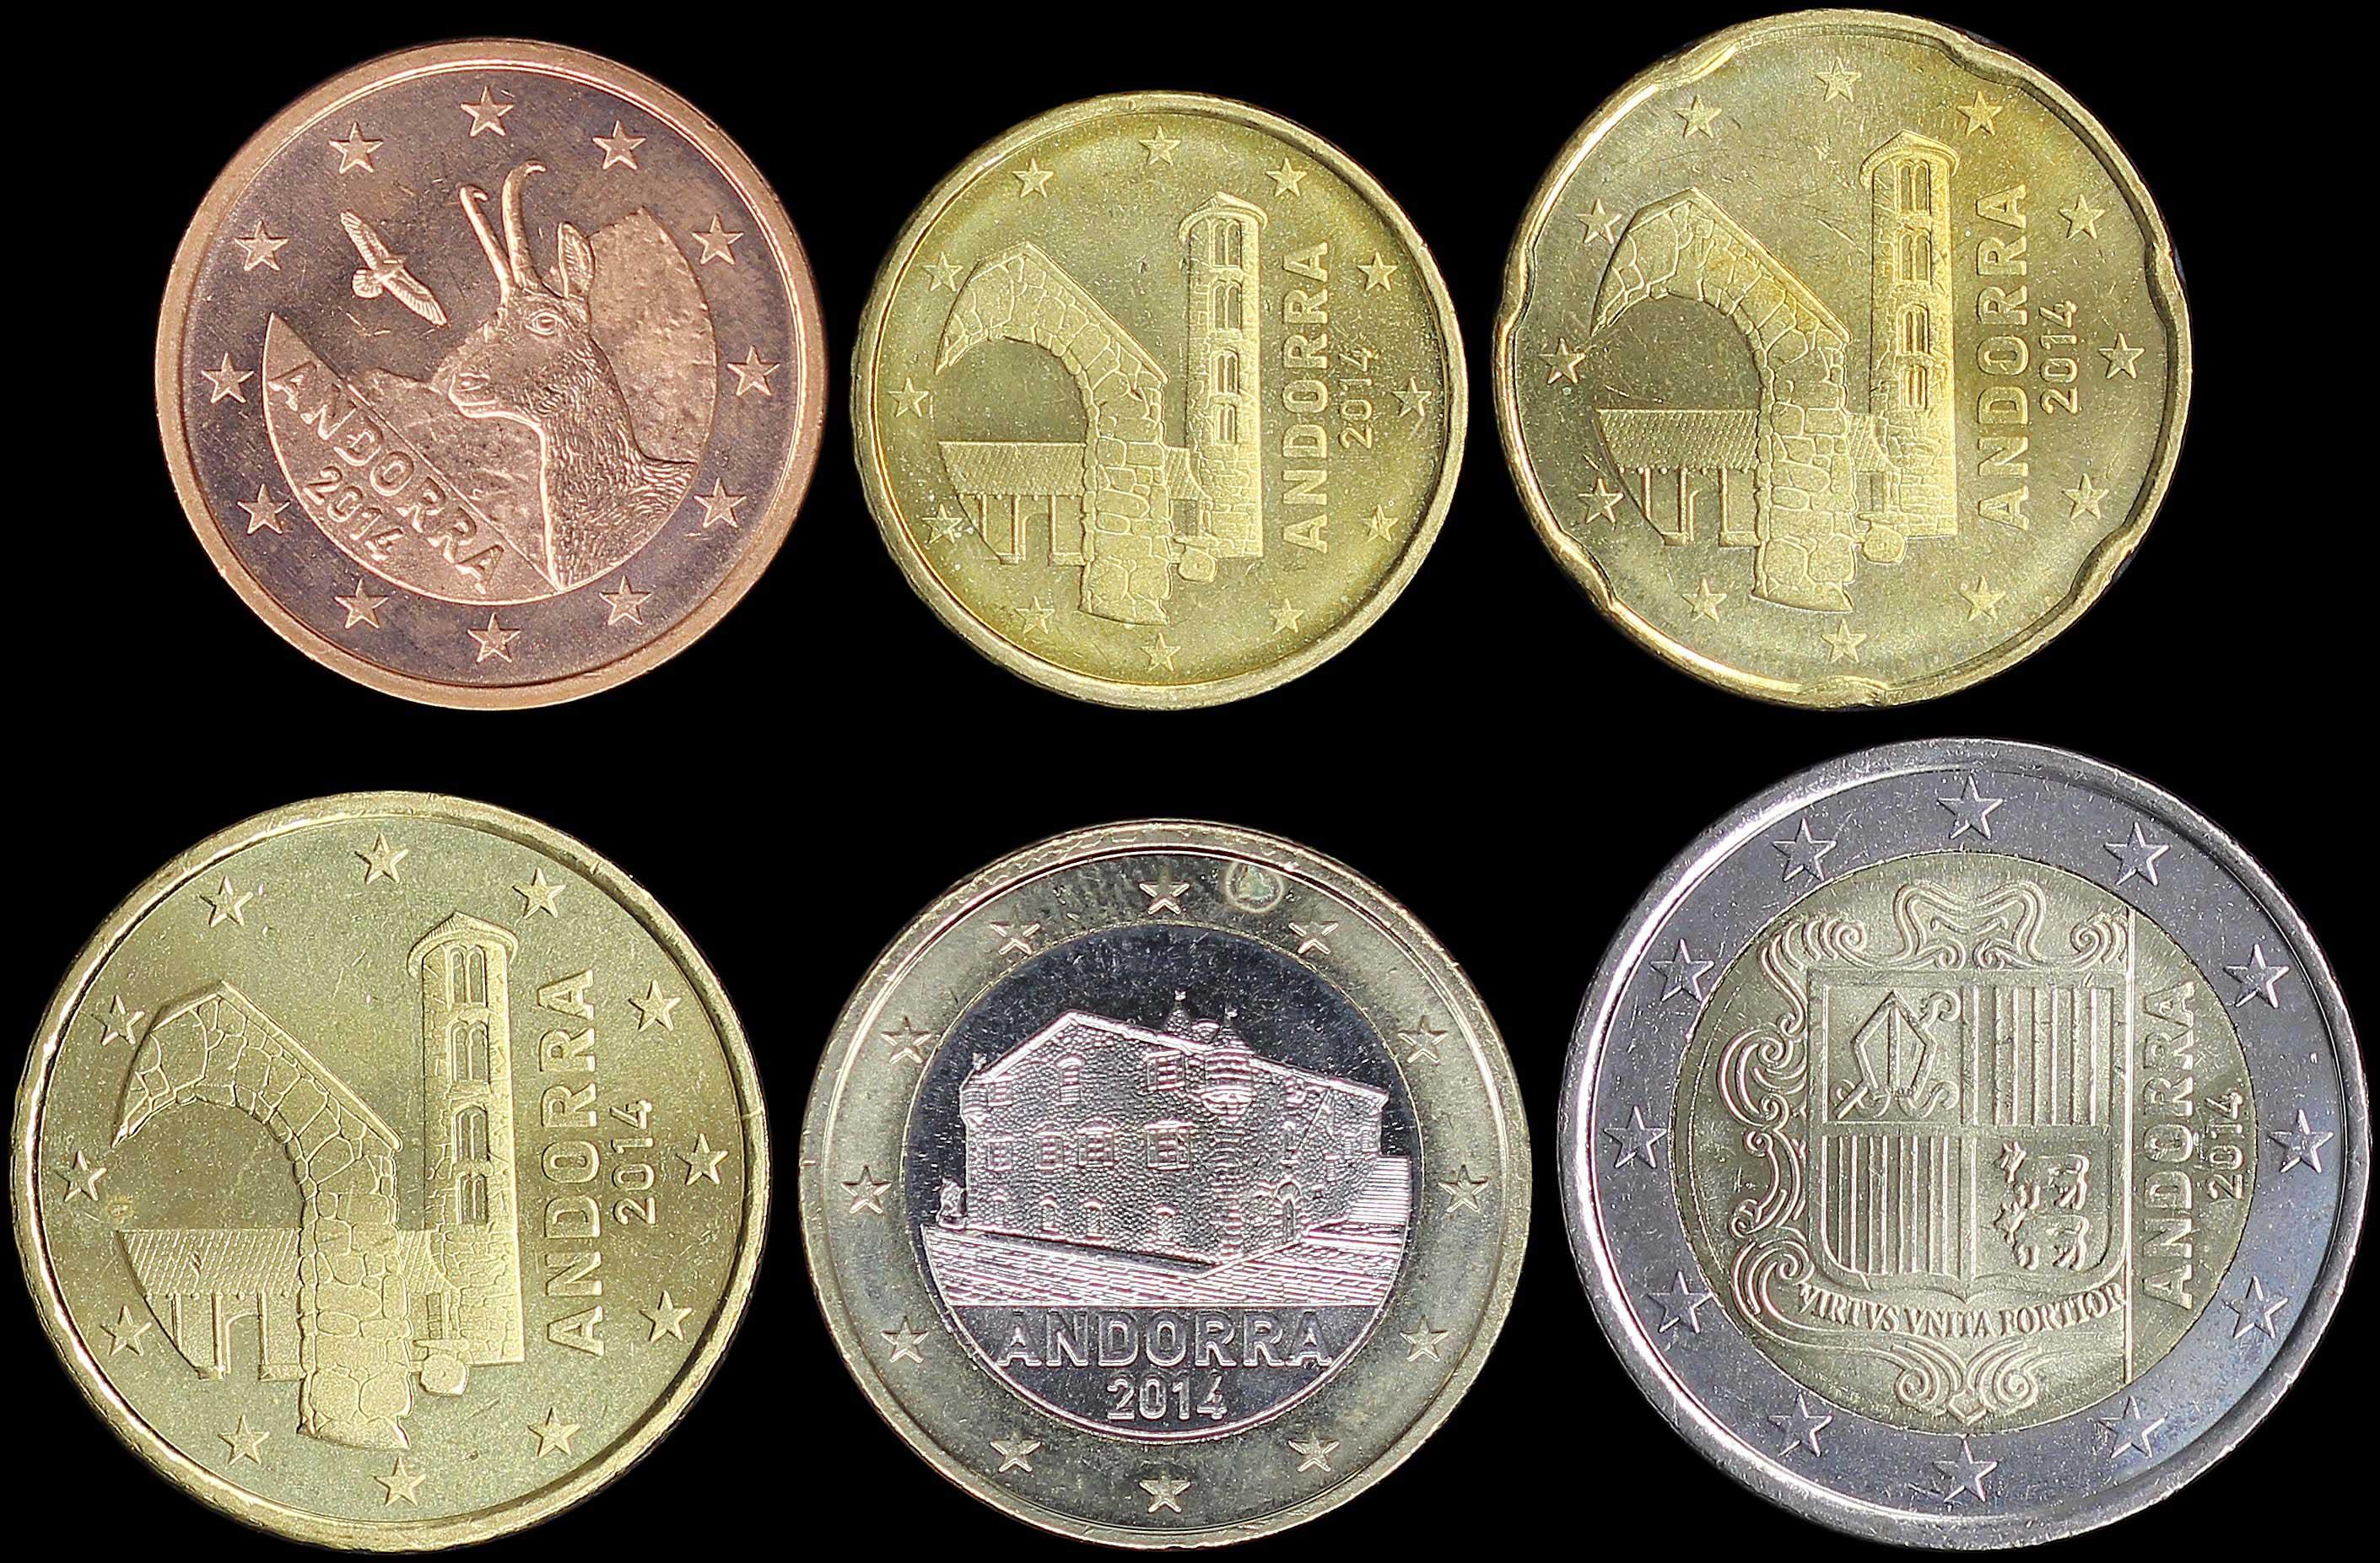 Lot 6782 - -  COINS & TOKENS COINS & TOKENS OF EUROPEAN COUNTRIES -  A. Karamitsos Postal & Live Internet Auction 984 (Part B)